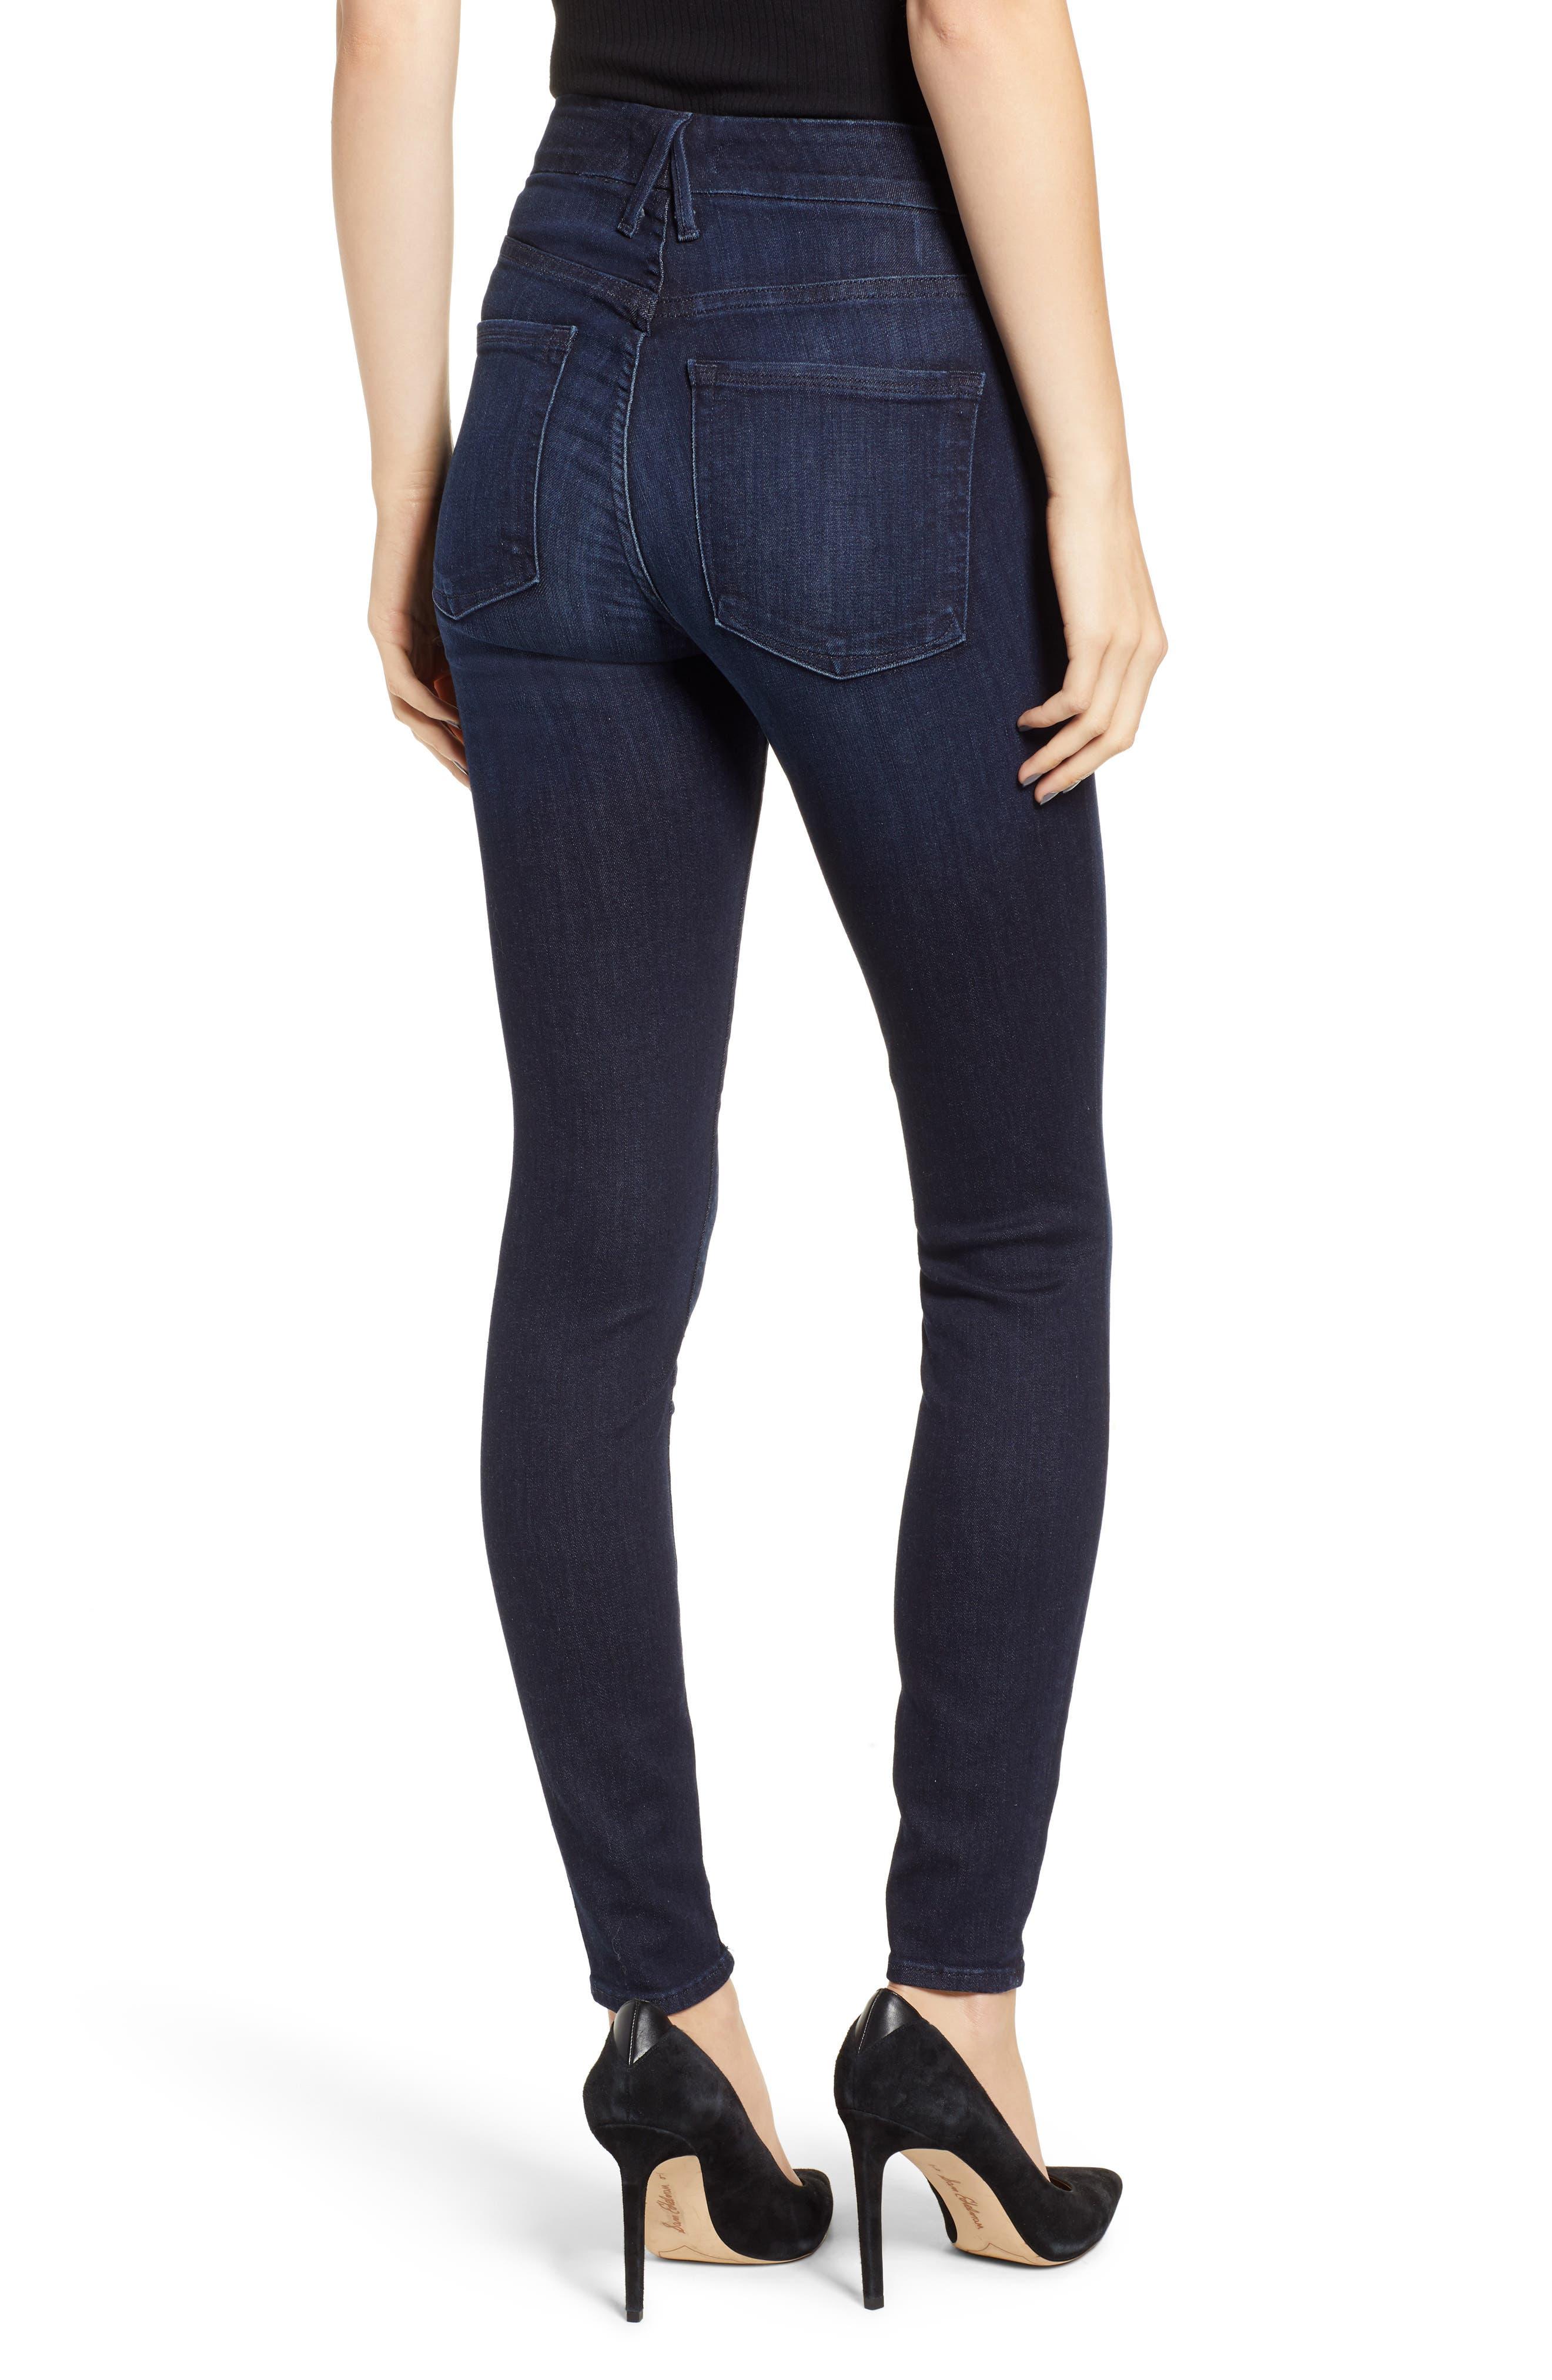 GOOD AMERICAN,                             Good Legs High Waist Skinny Jeans,                             Alternate thumbnail 3, color,                             BLUE224